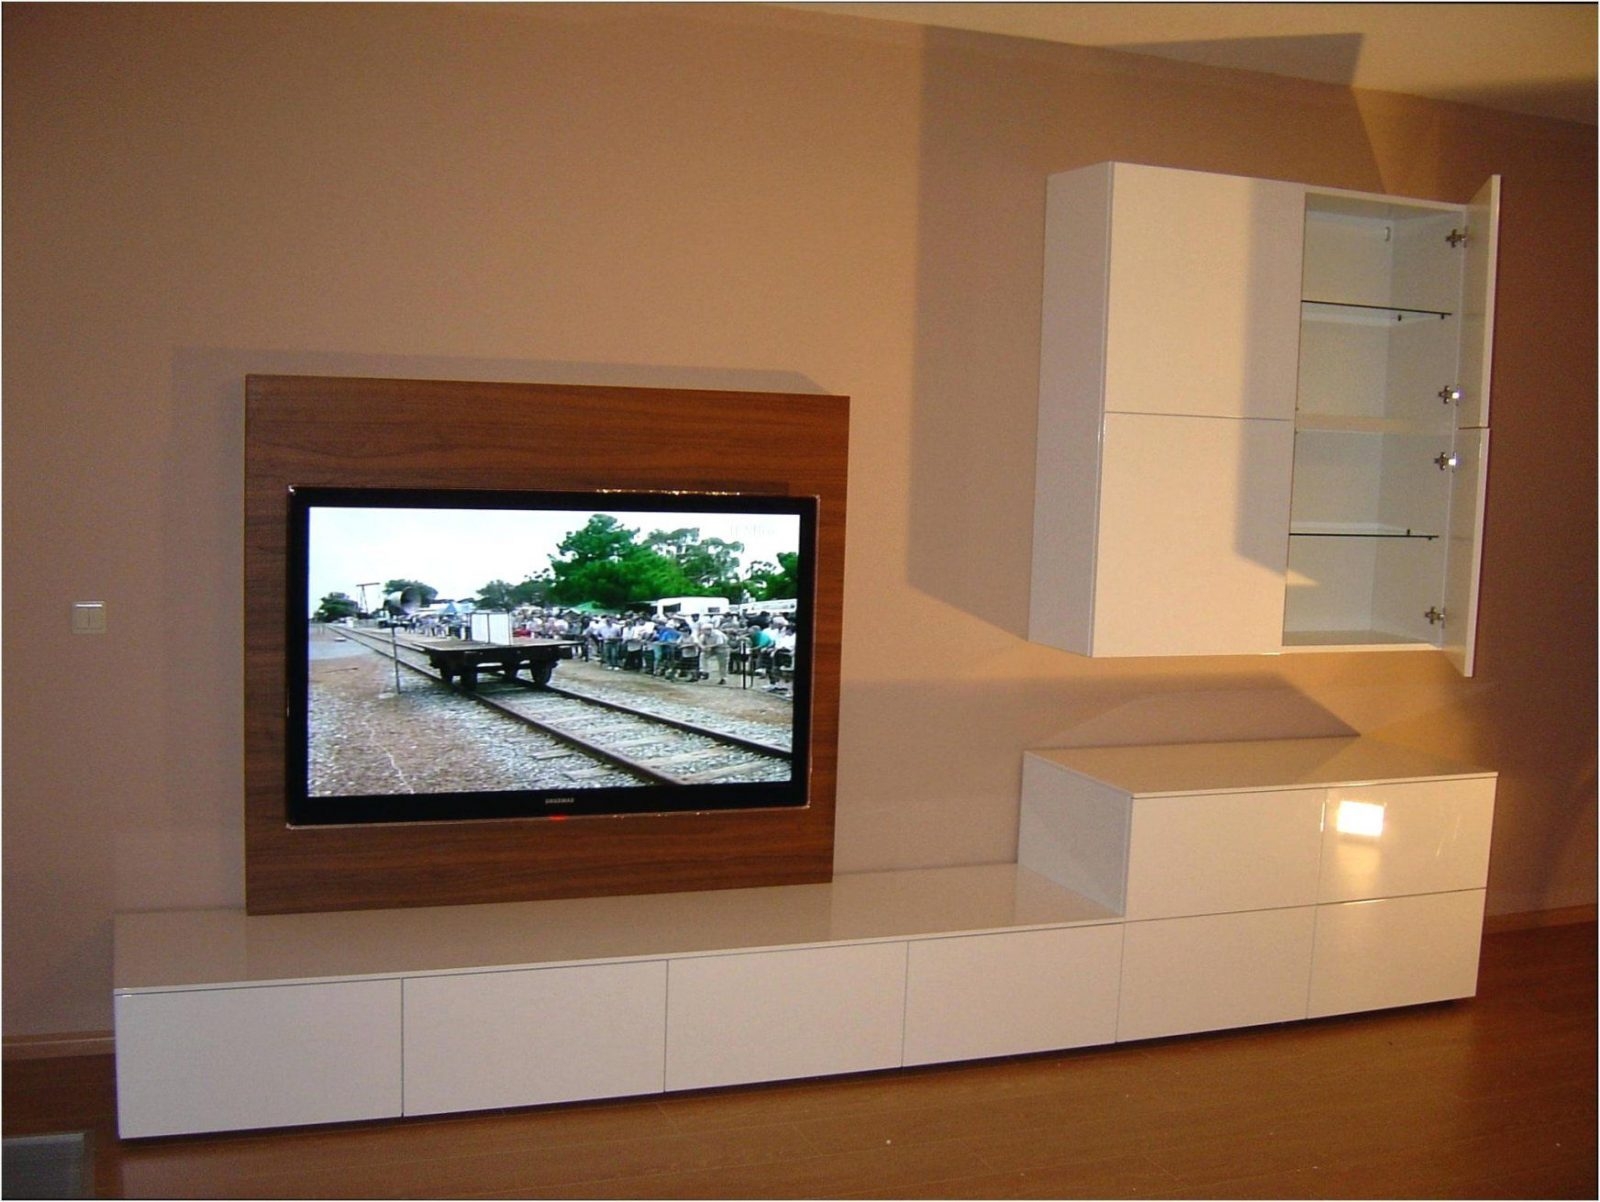 Medienwand wohnzimmer genial tv wand selber bauen laminat haus von - Tv wand selber bauen laminat ...